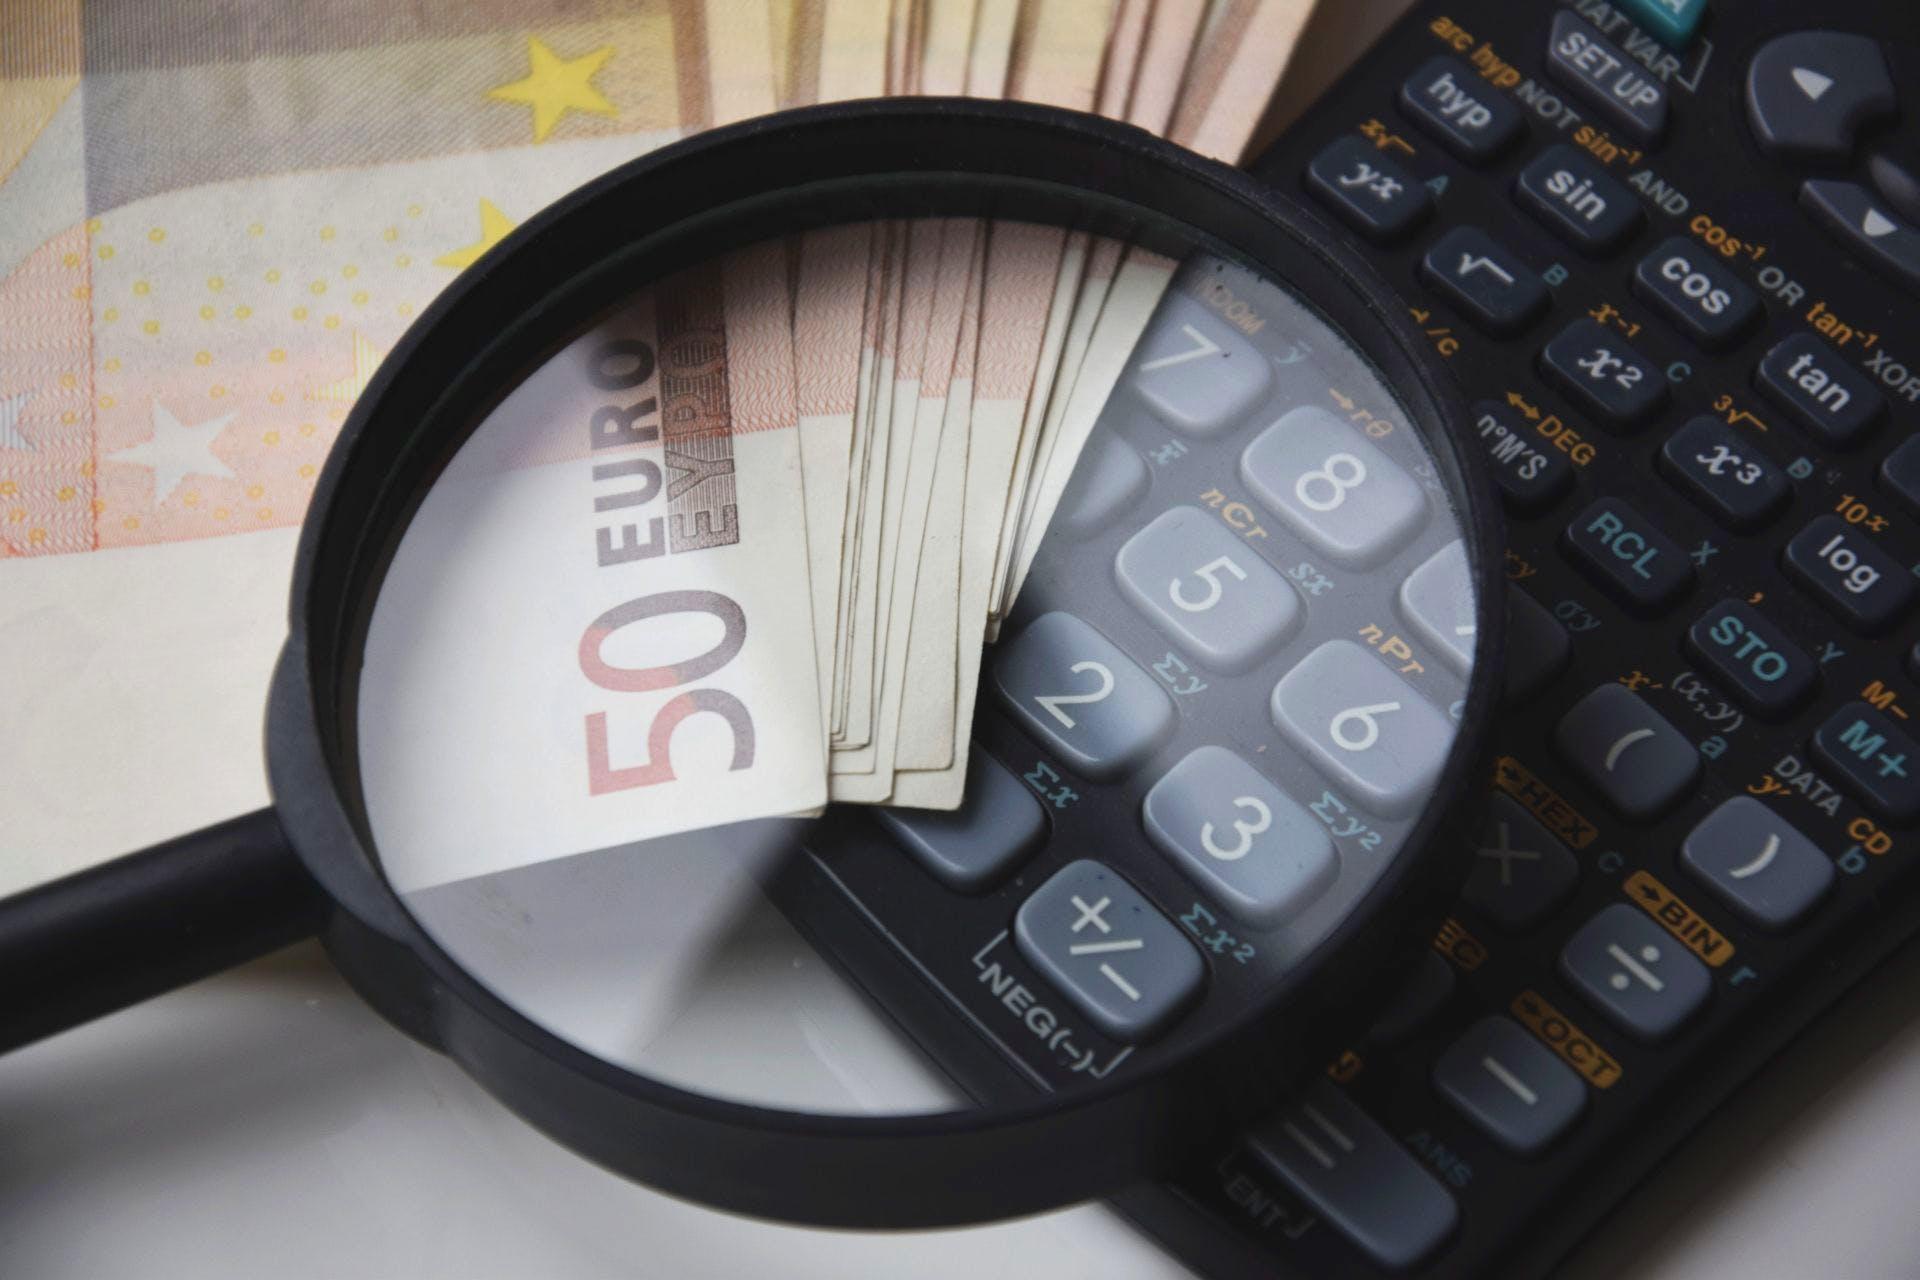 50 Euro Banknote Beside Black Calculator